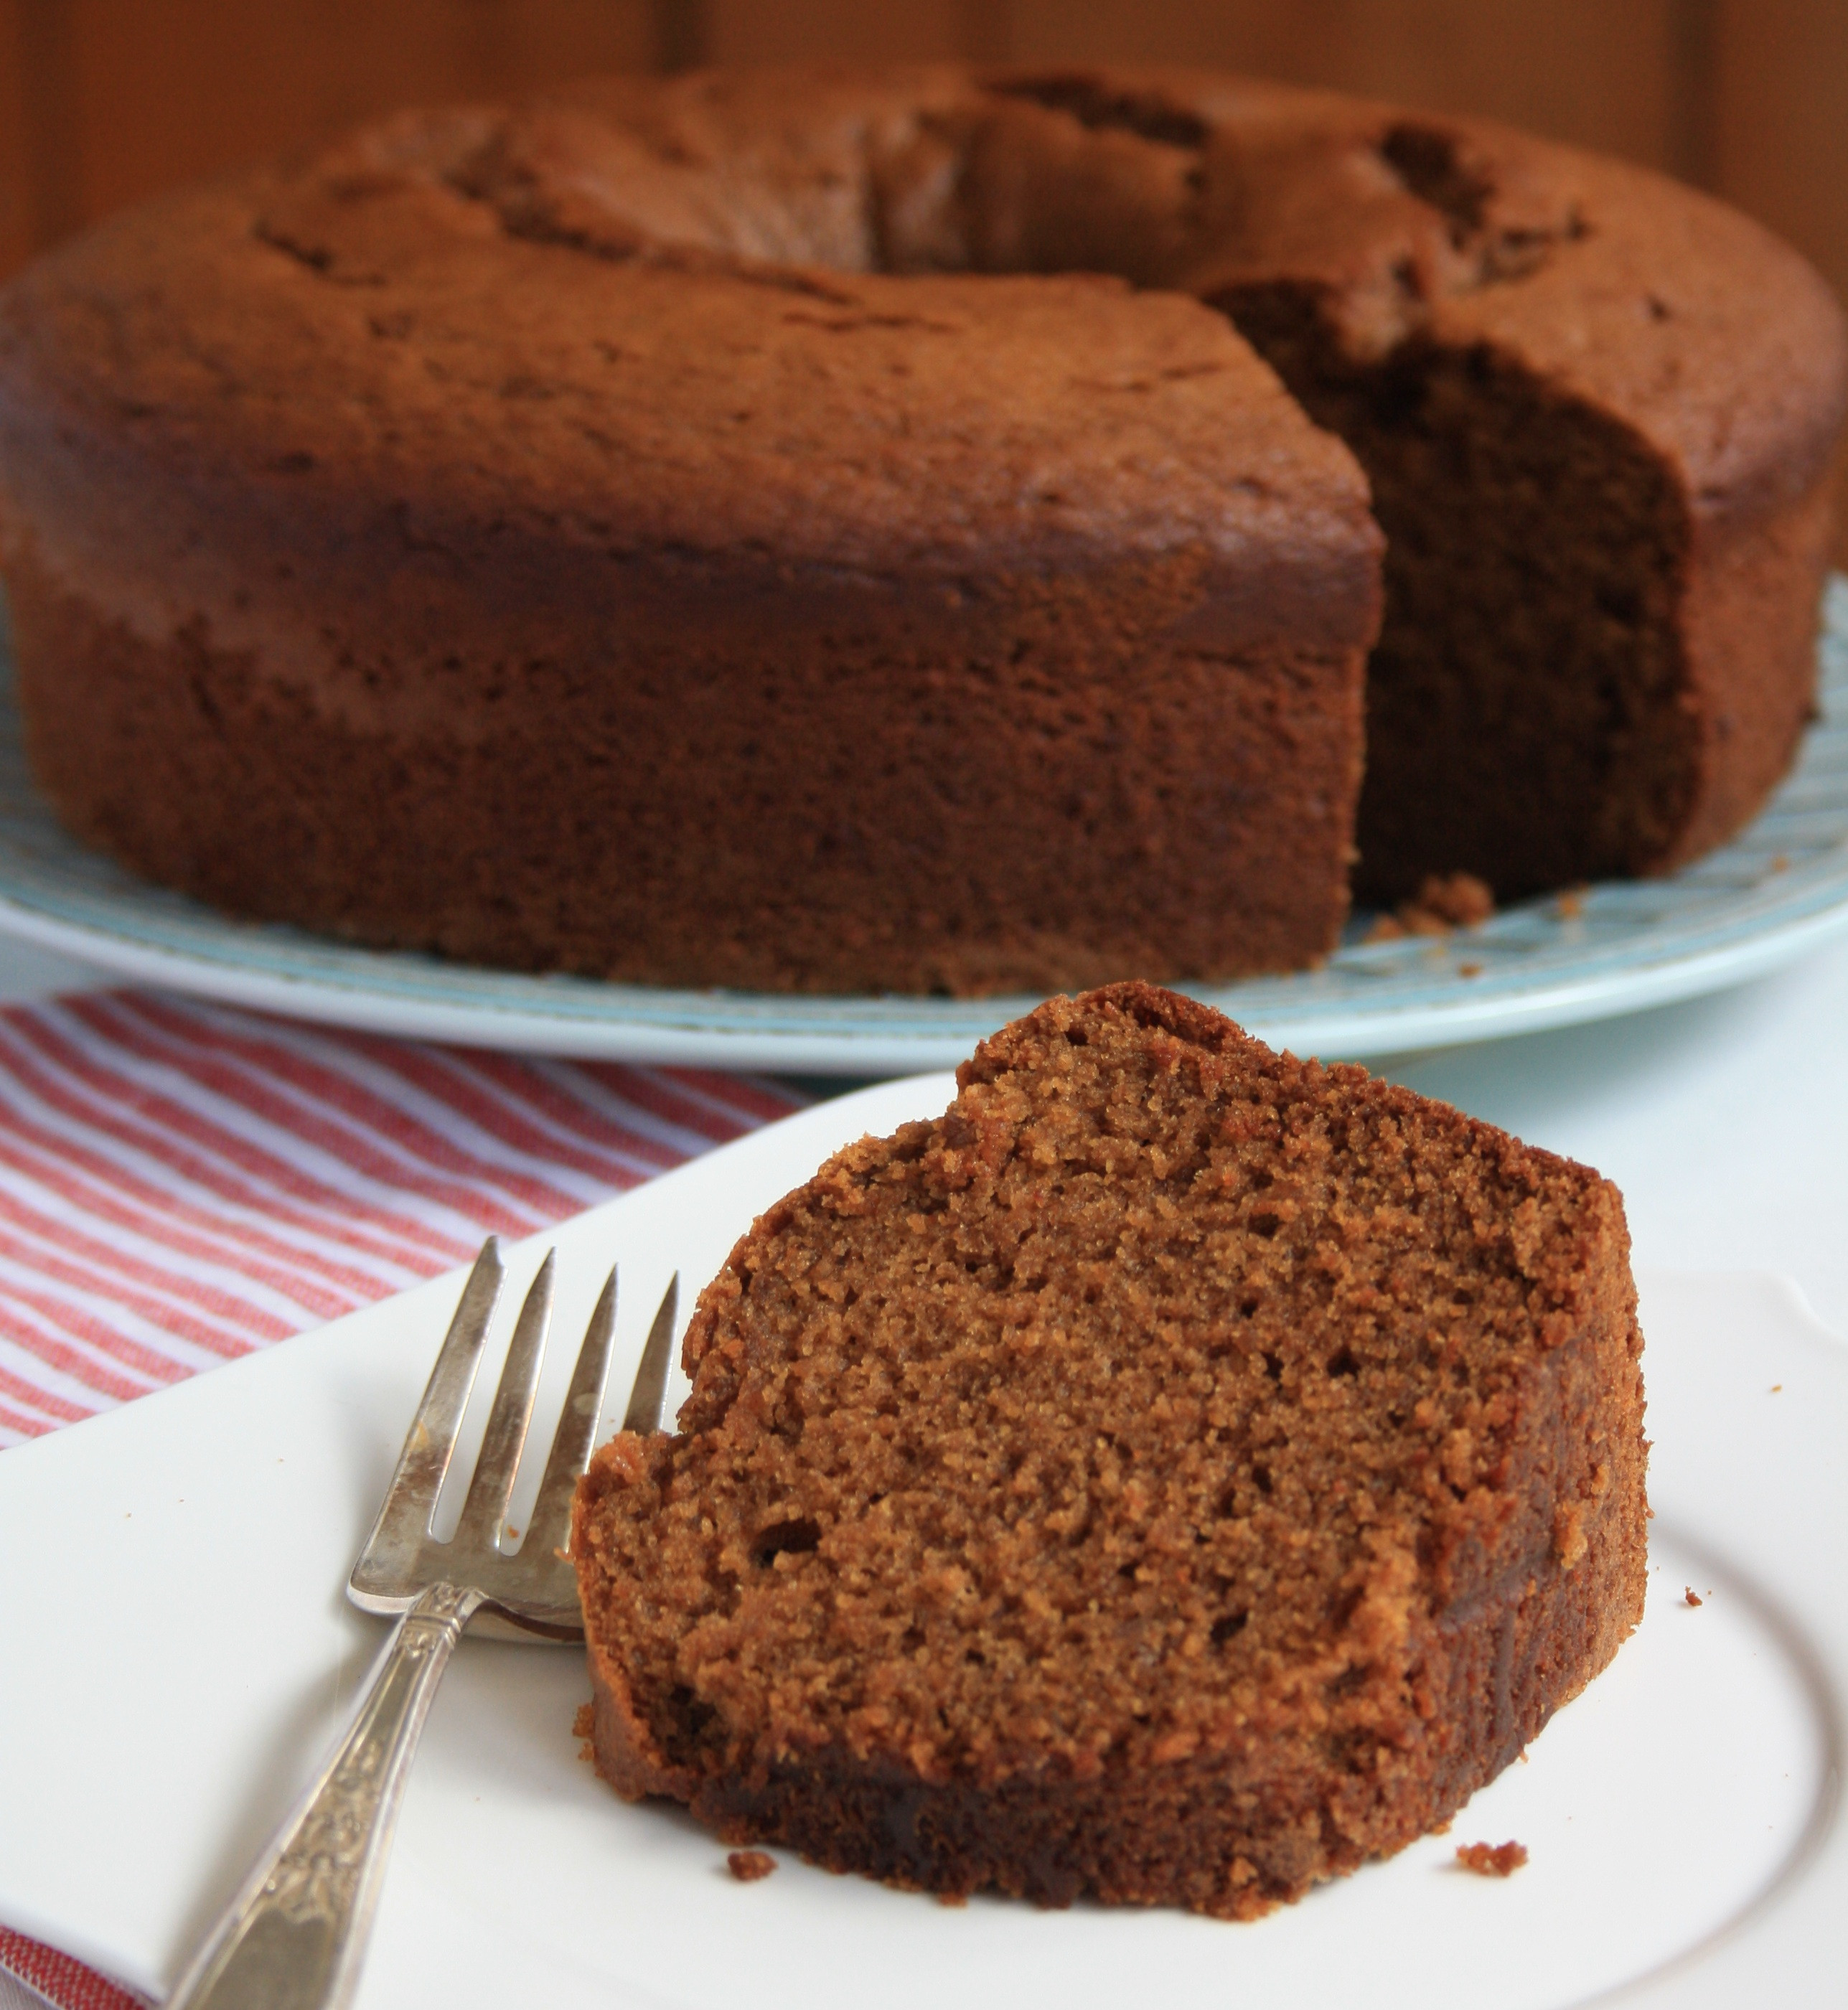 Applesauce Cake Recipe  Whole wheat applesauce cake recipe & memories made in the